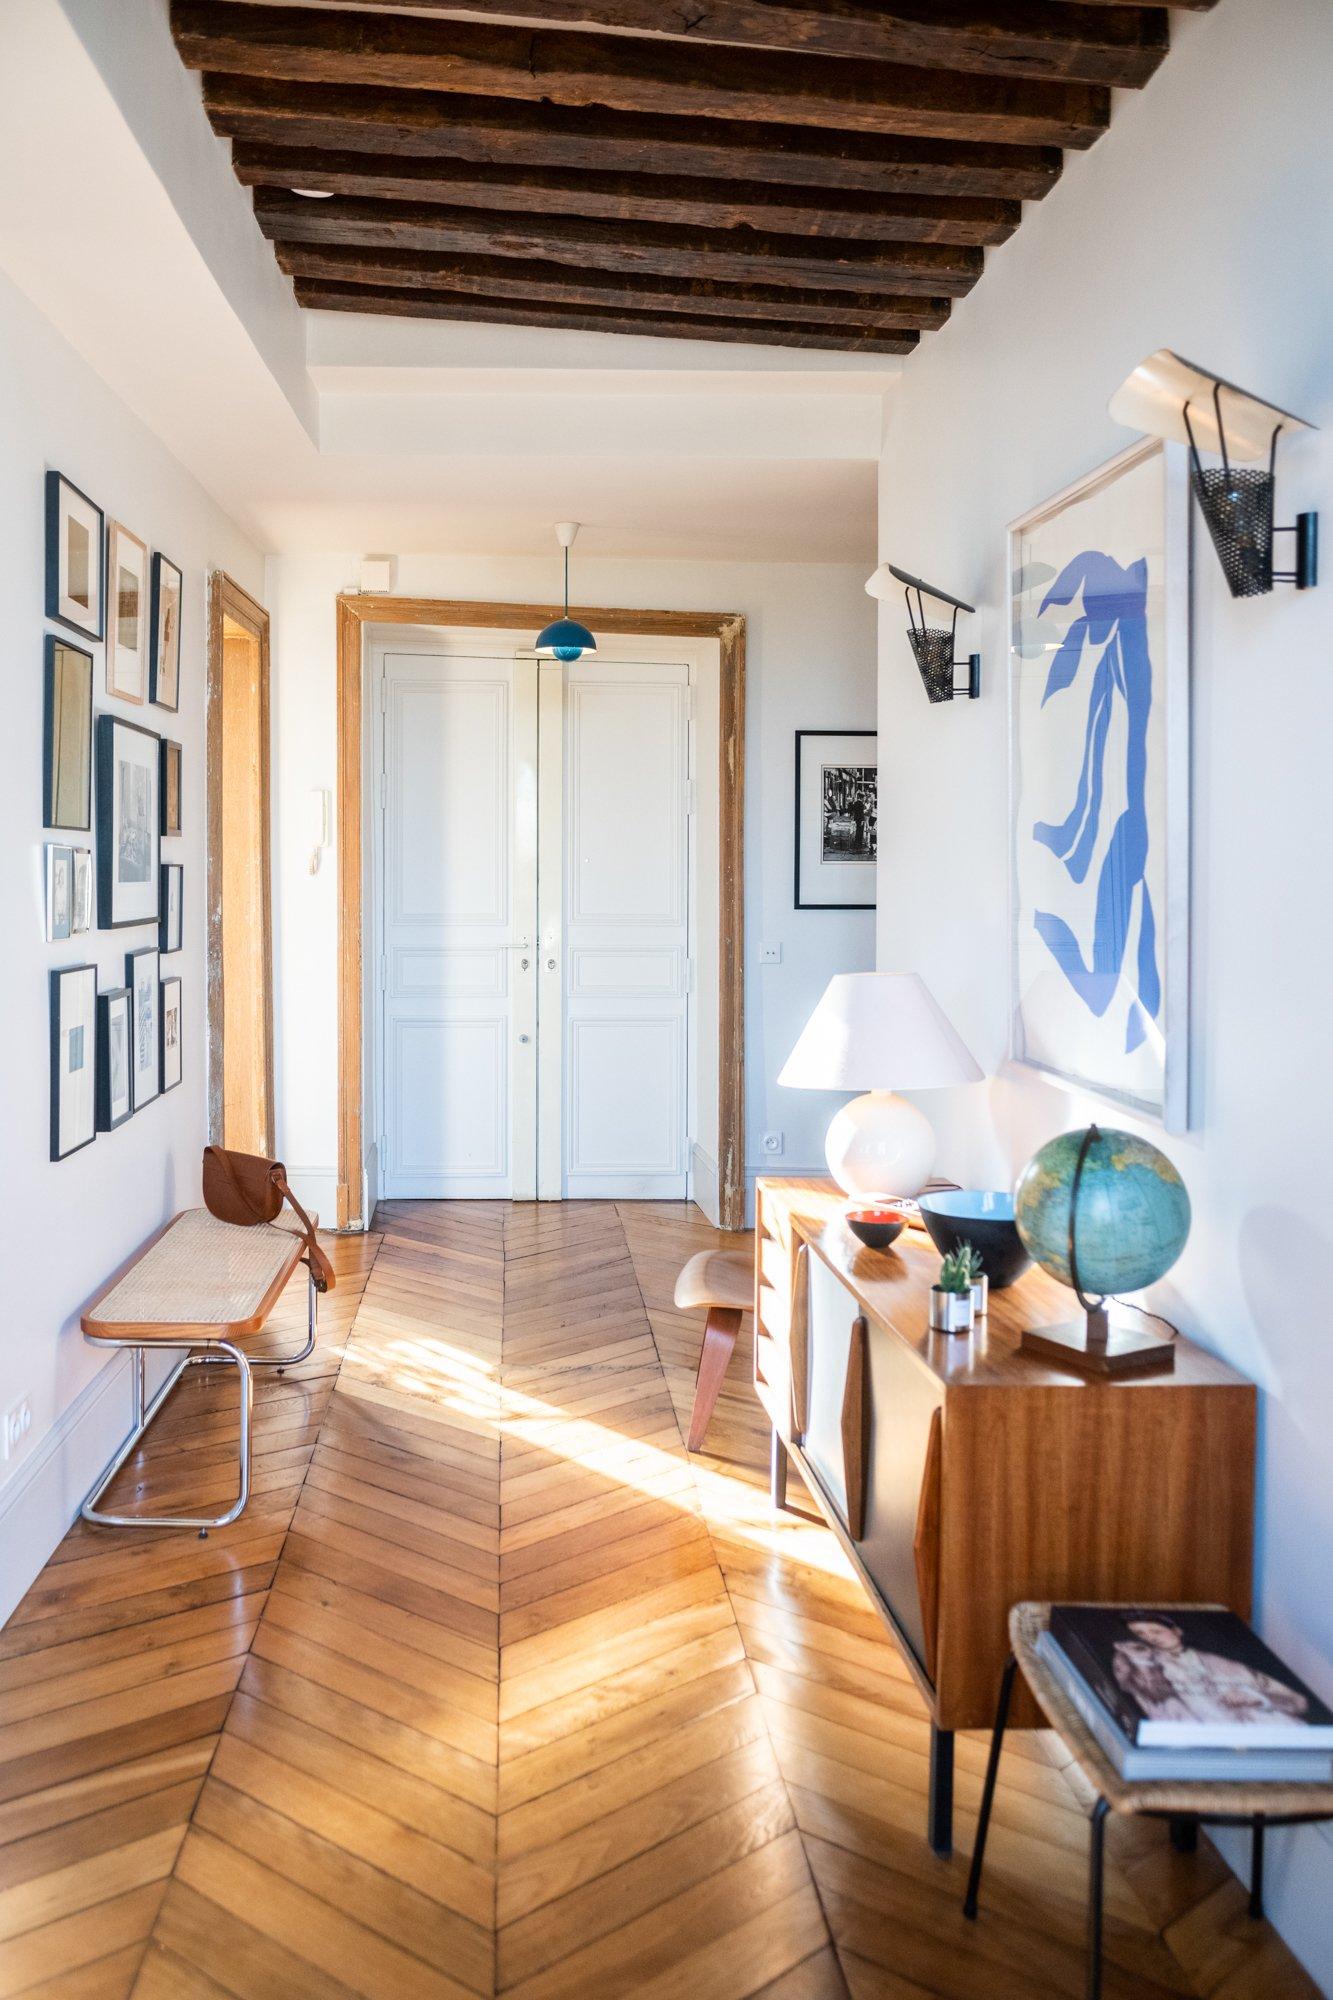 Entrée Appartement Famille Co-fondatrice Wilo & Grove Fanny Saulay et Thomas Seydoux